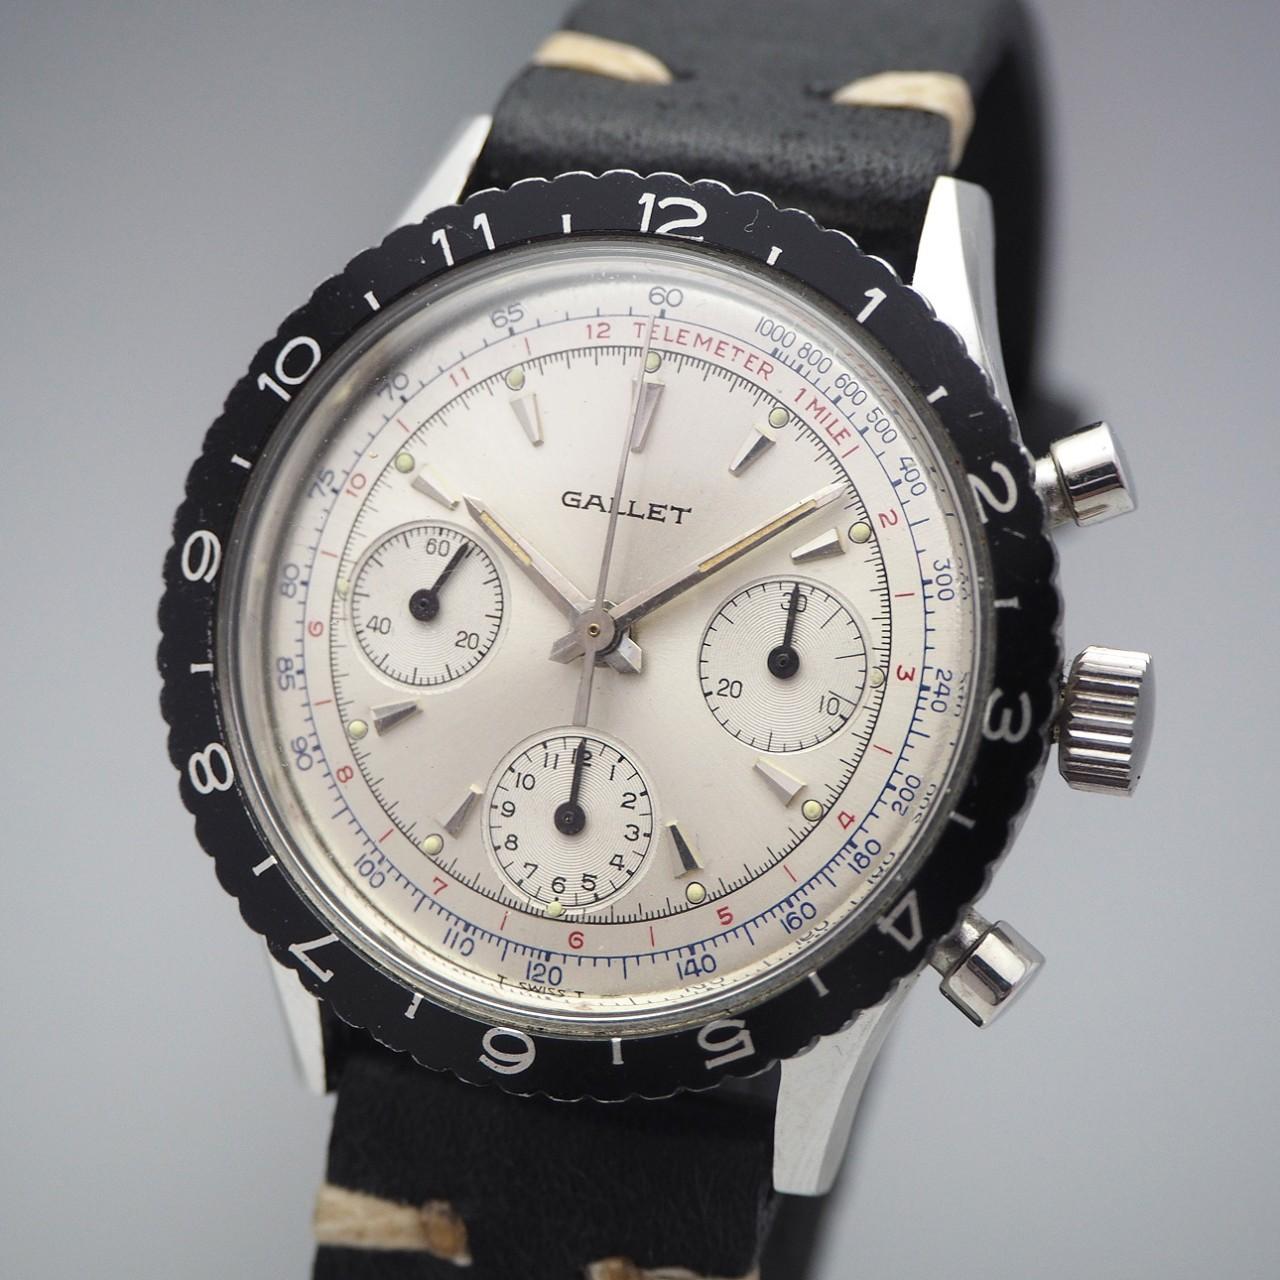 Gallet MultiChron Chronograph Valjoux 726